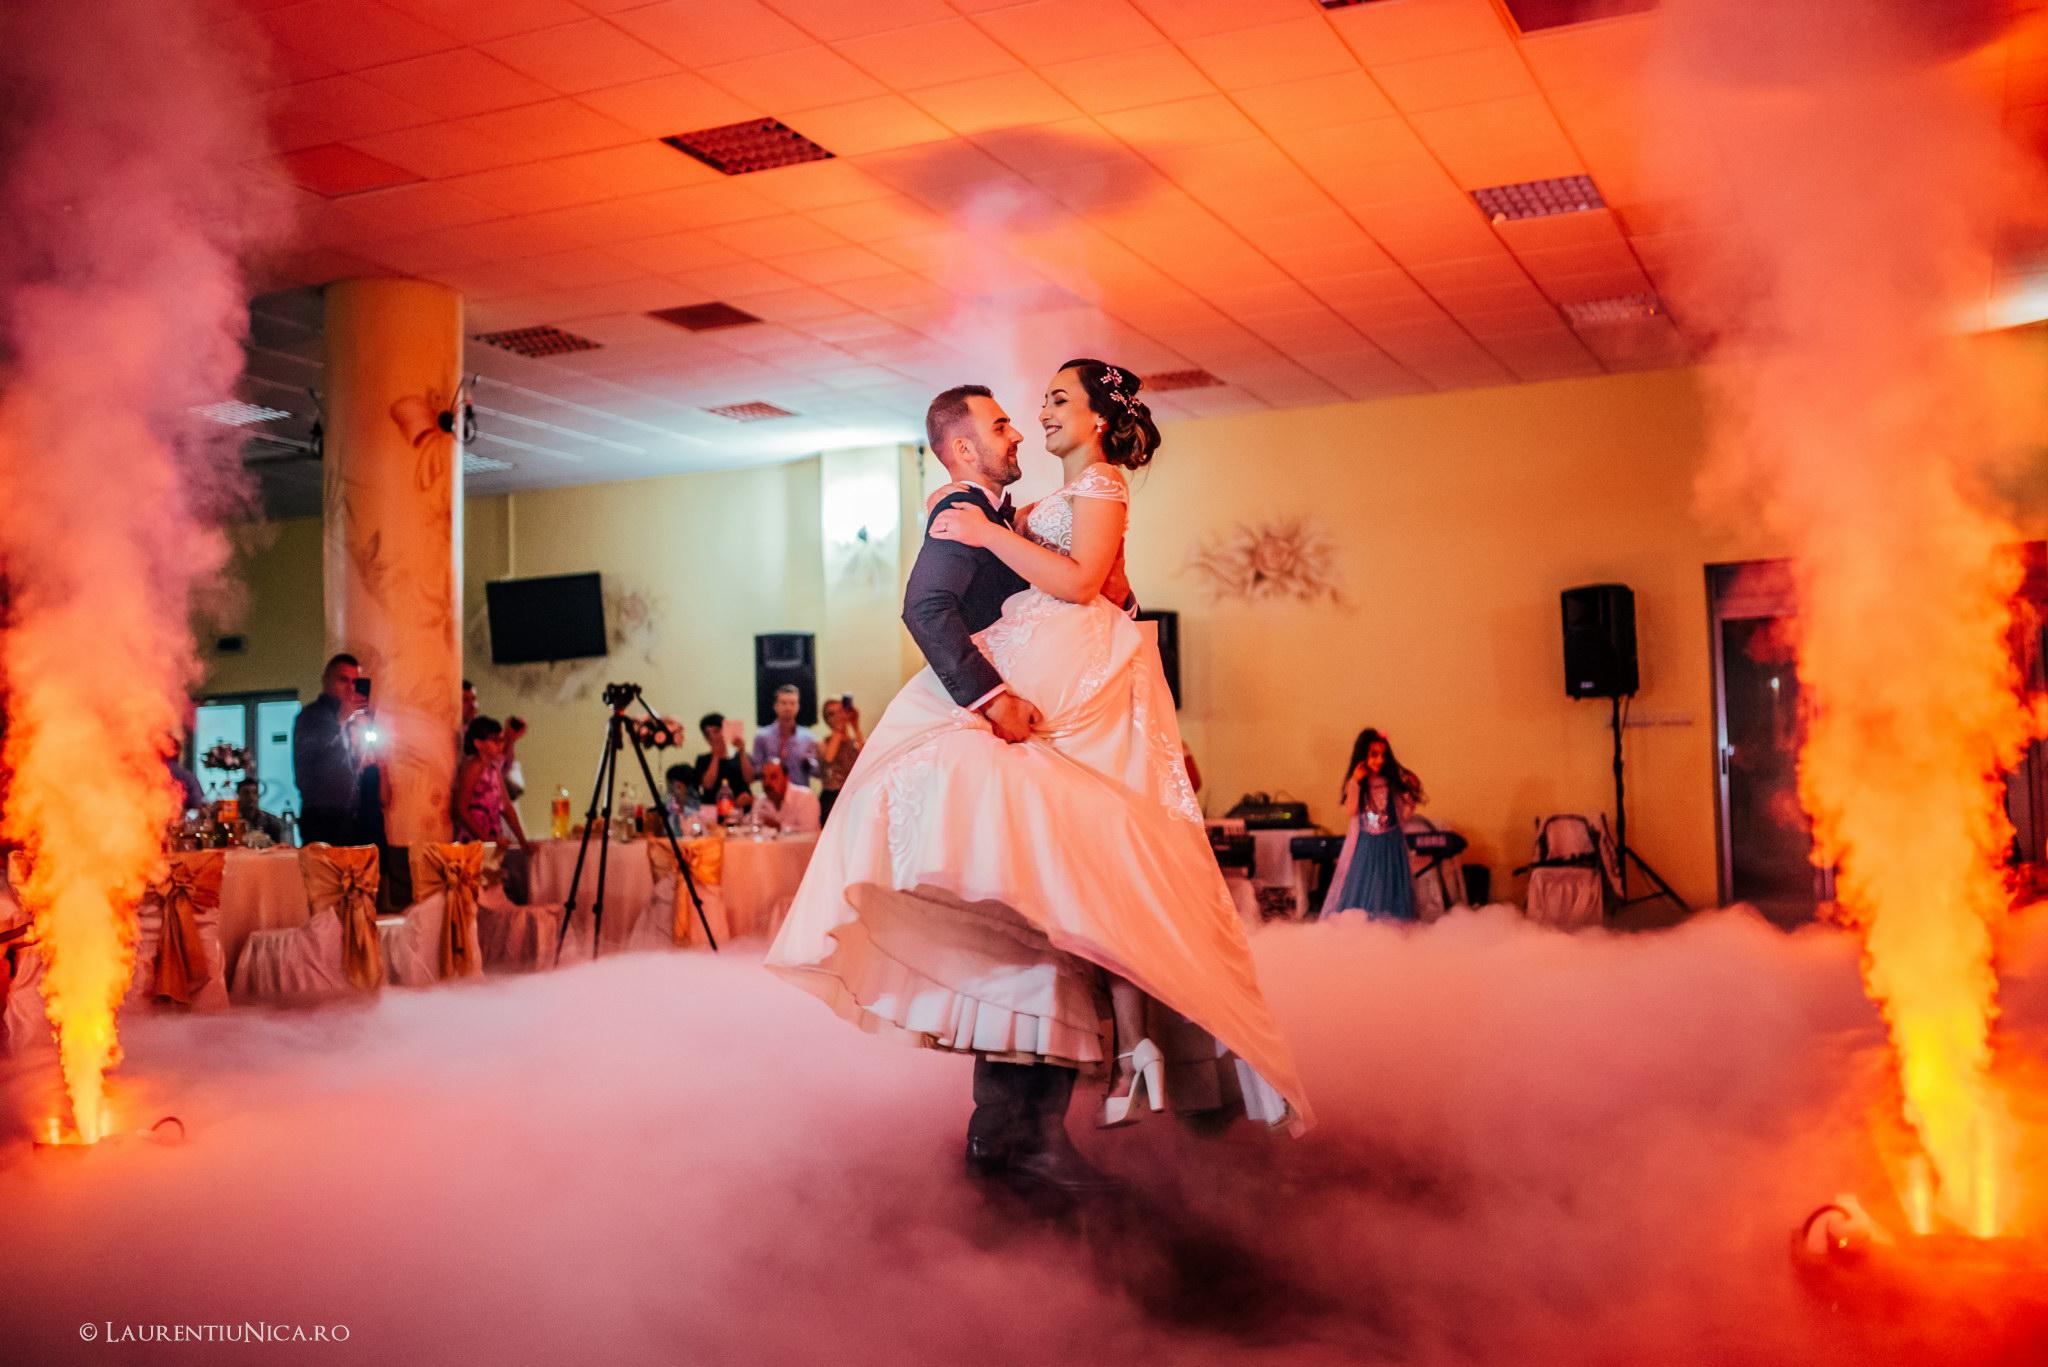 daiana si madalin fotograf nunta laurentiu nica targu jiu gorj 25 - Daiana & Madalin | Fotografii nunta | Targu-Jiu | Gorj